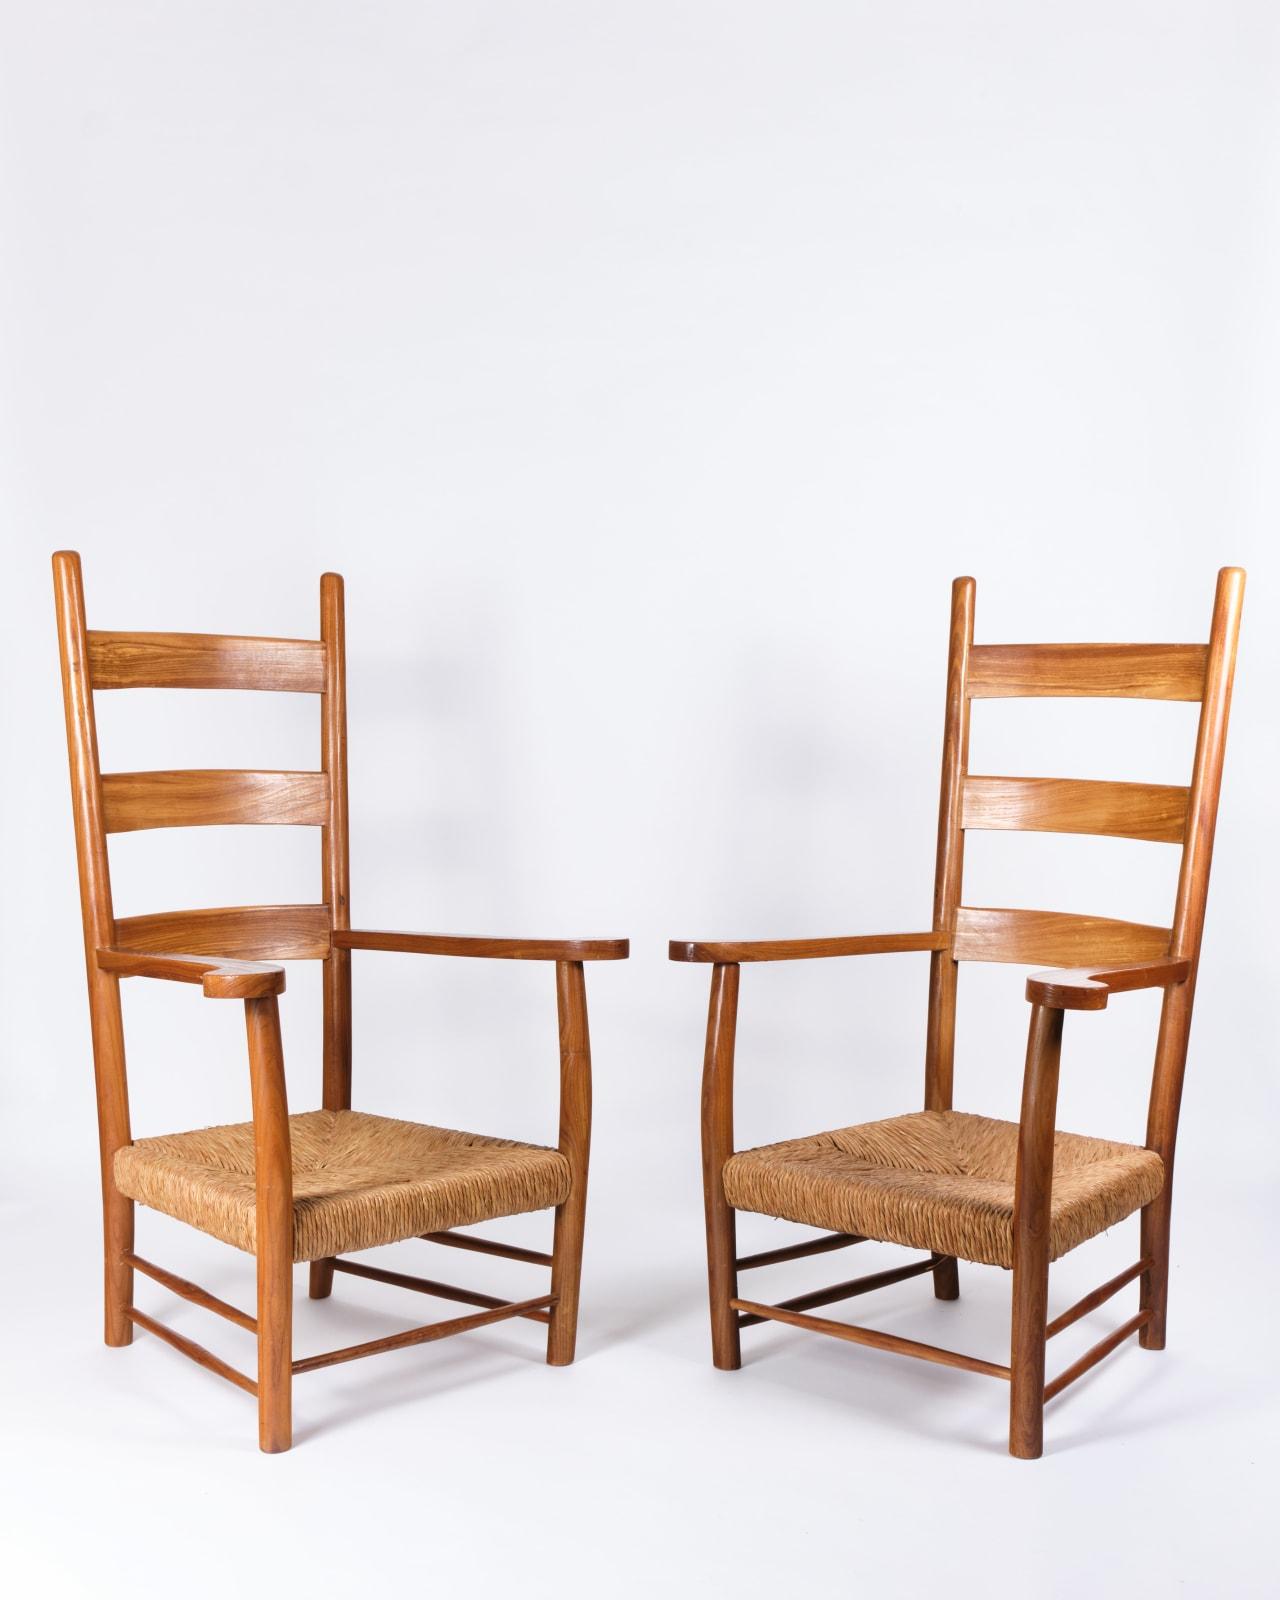 Paolo Buffa, Pair of armchairs